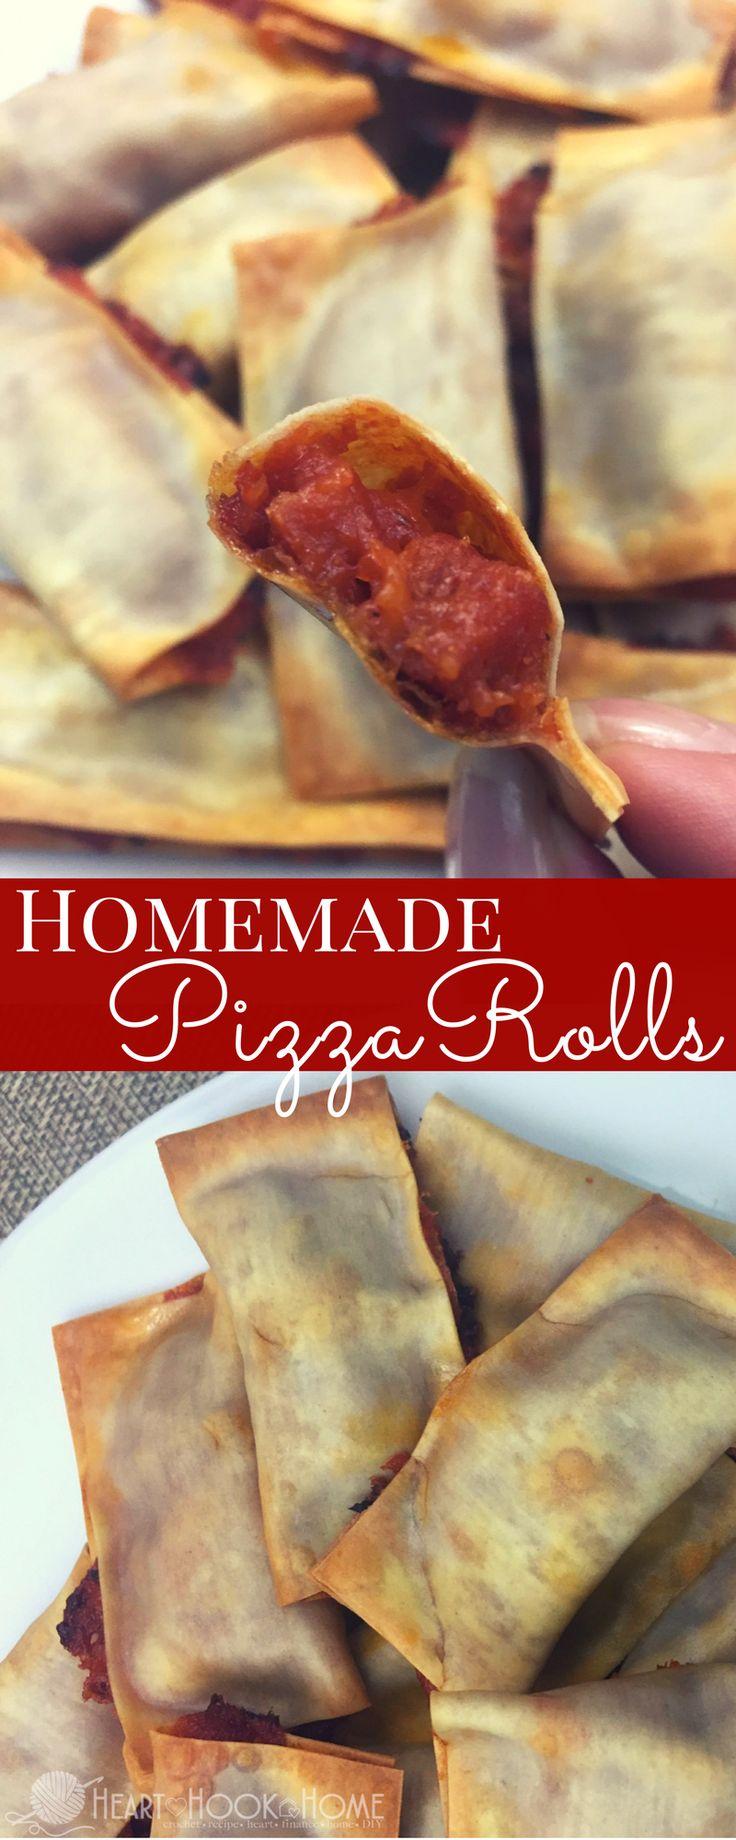 Homemade (Baked) Pizza Rolls http://hearthookhome.com/homemade-pizza-rolls/?utm_campaign=coschedule&utm_source=pinterest&utm_medium=Ashlea%20K%20-%20Heart%2C%20Hook%2C%20Home&utm_content=Homemade%20%28Baked%29%20Pizza%20Rolls